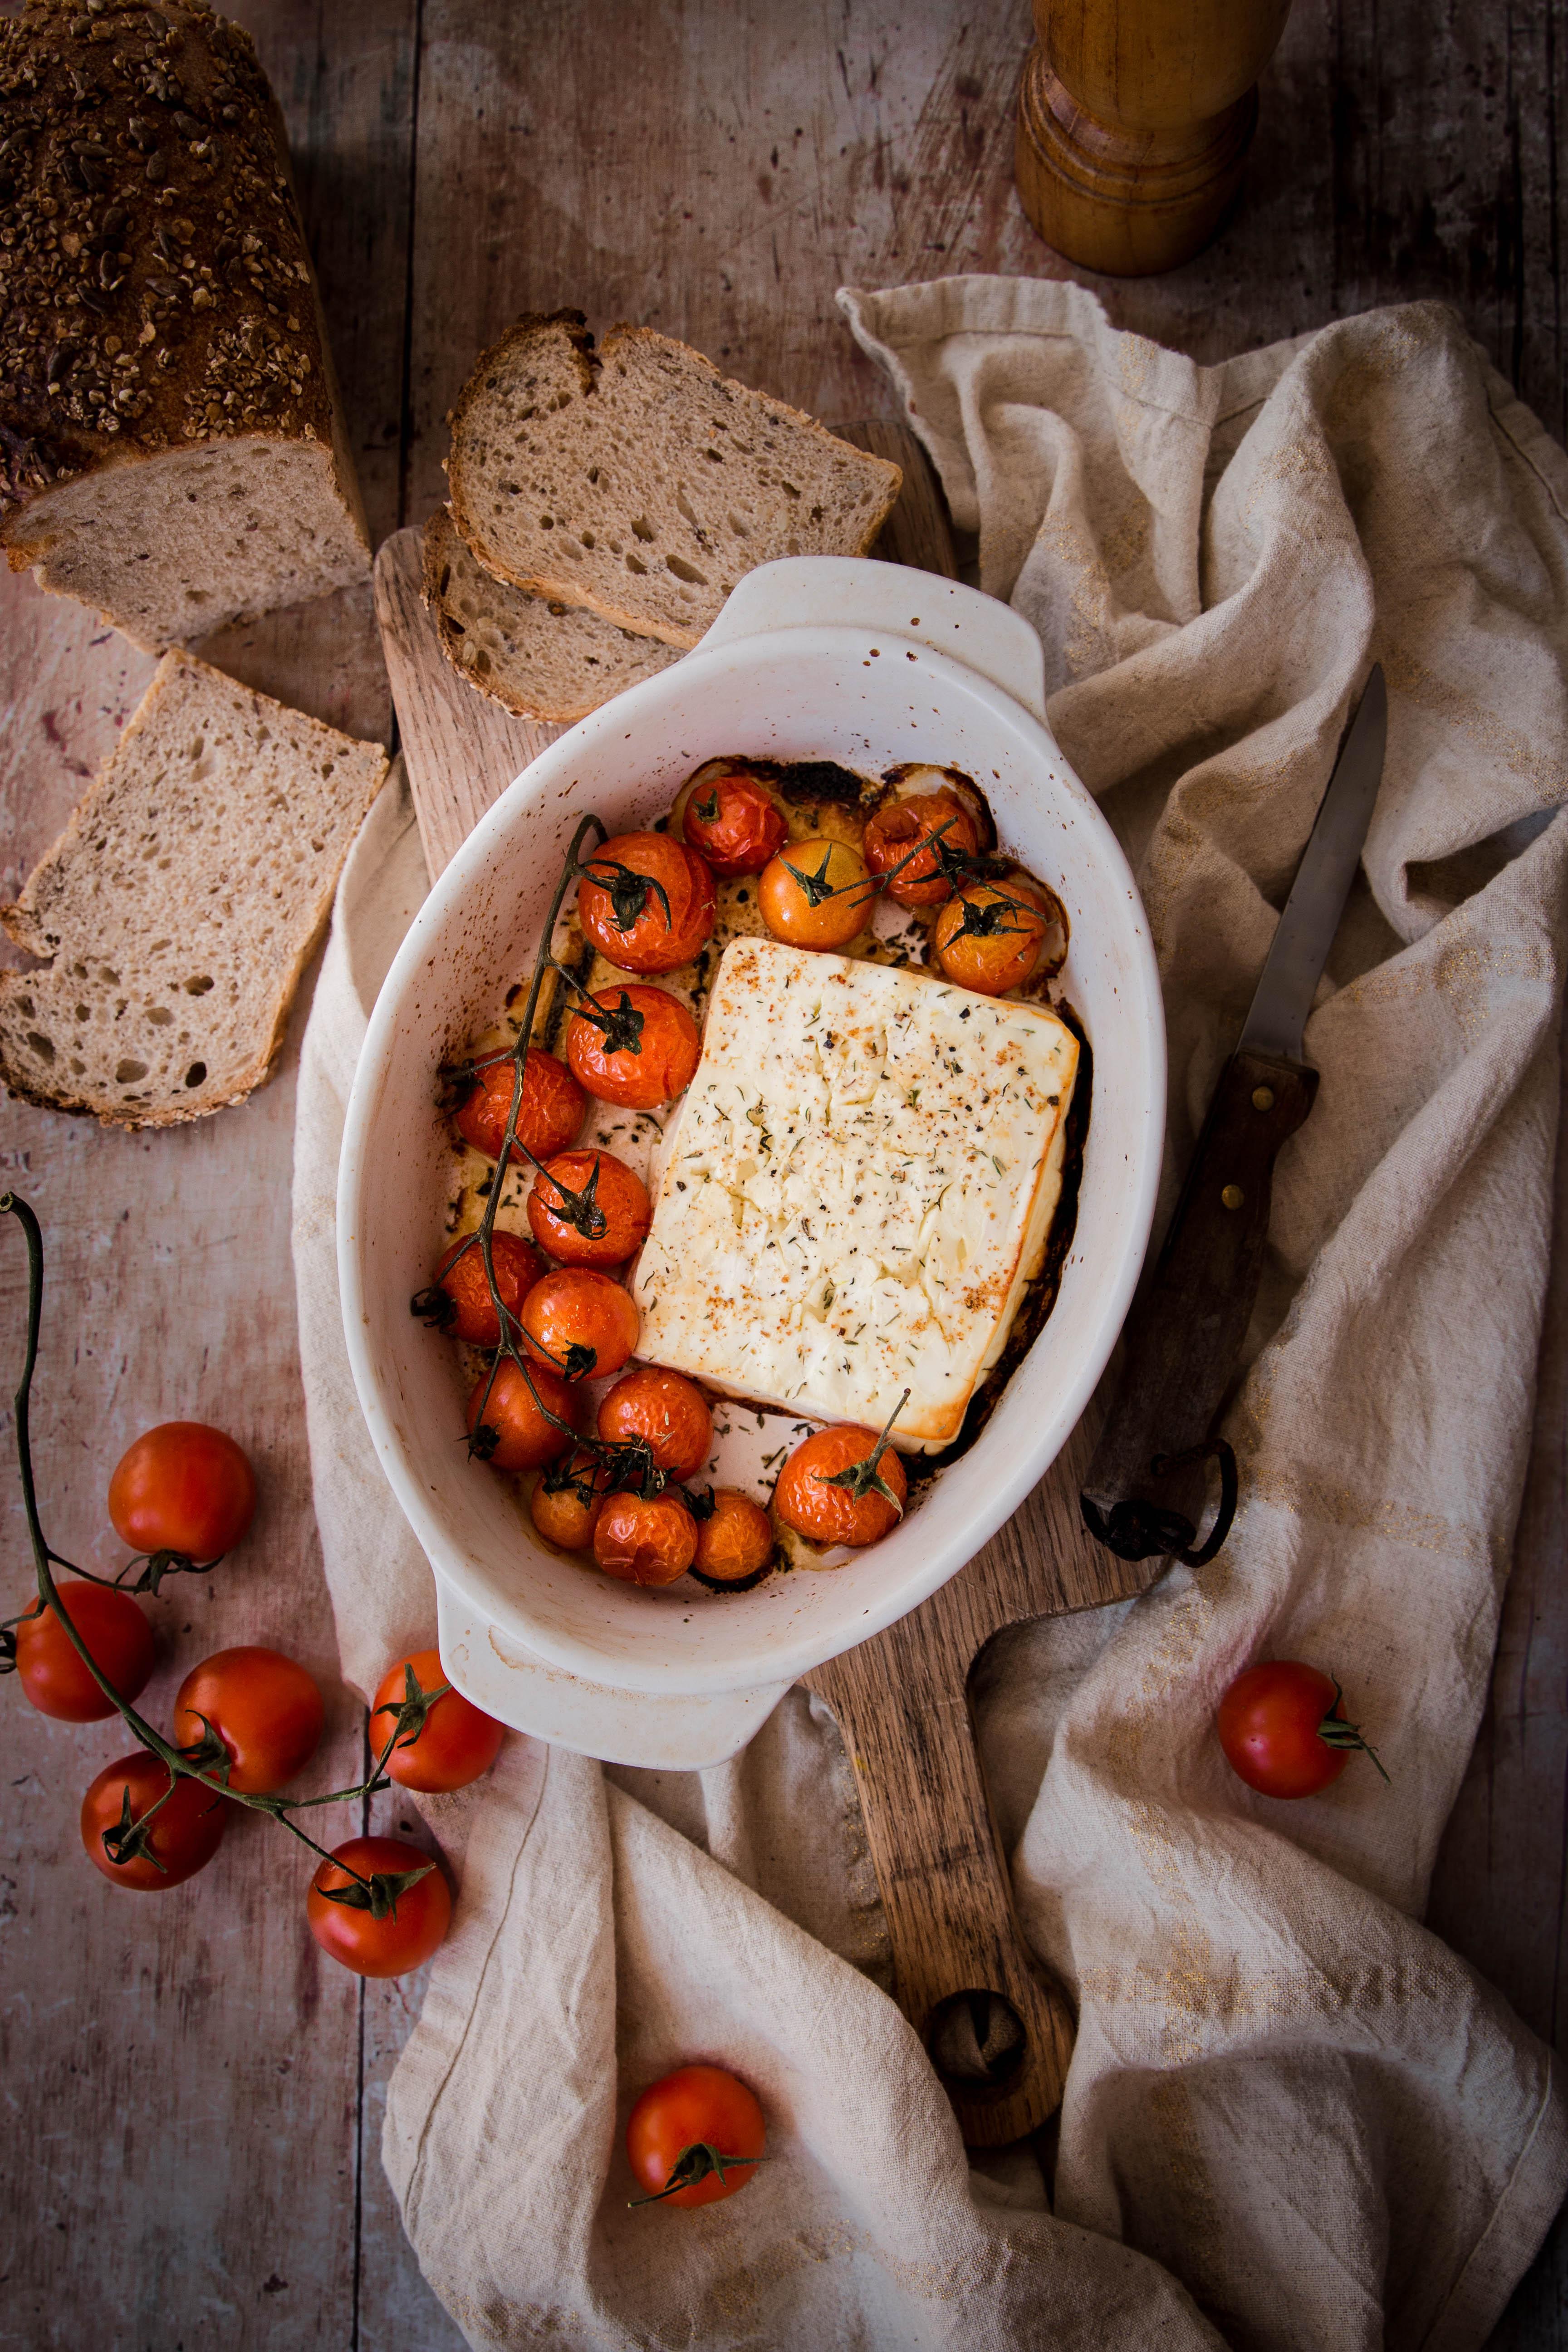 Feta et tomates cerises rôties - roasted feta photography